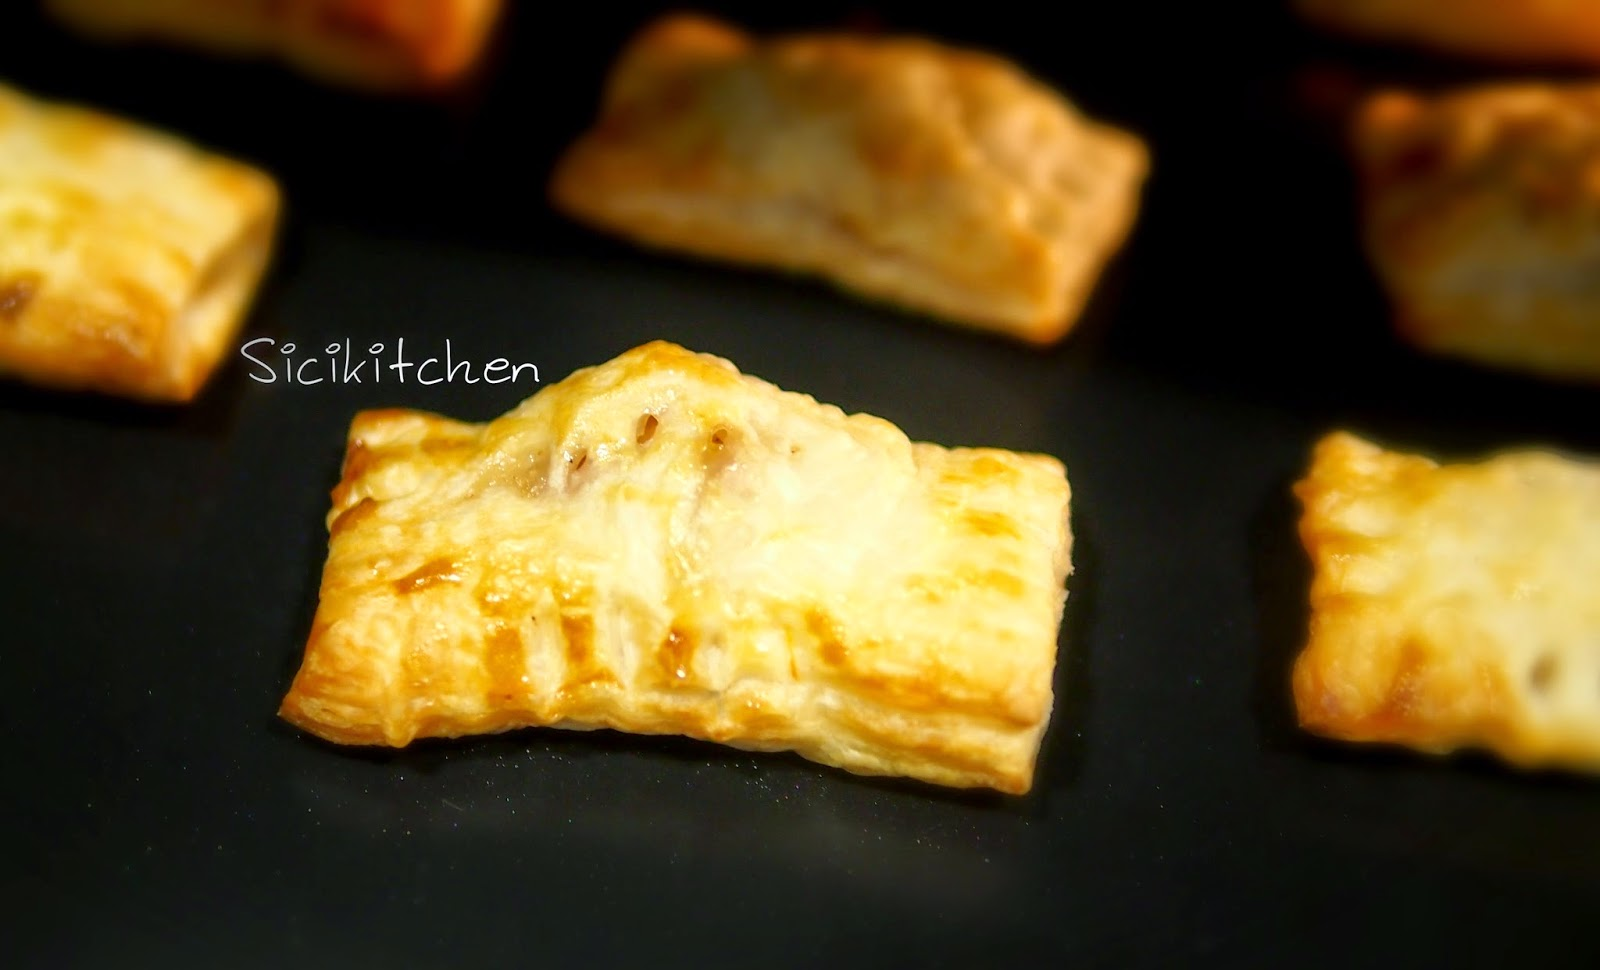 Sicikitchen: 【20分鐘美味下午茶食譜】迷你一口蘋果酥-附食譜